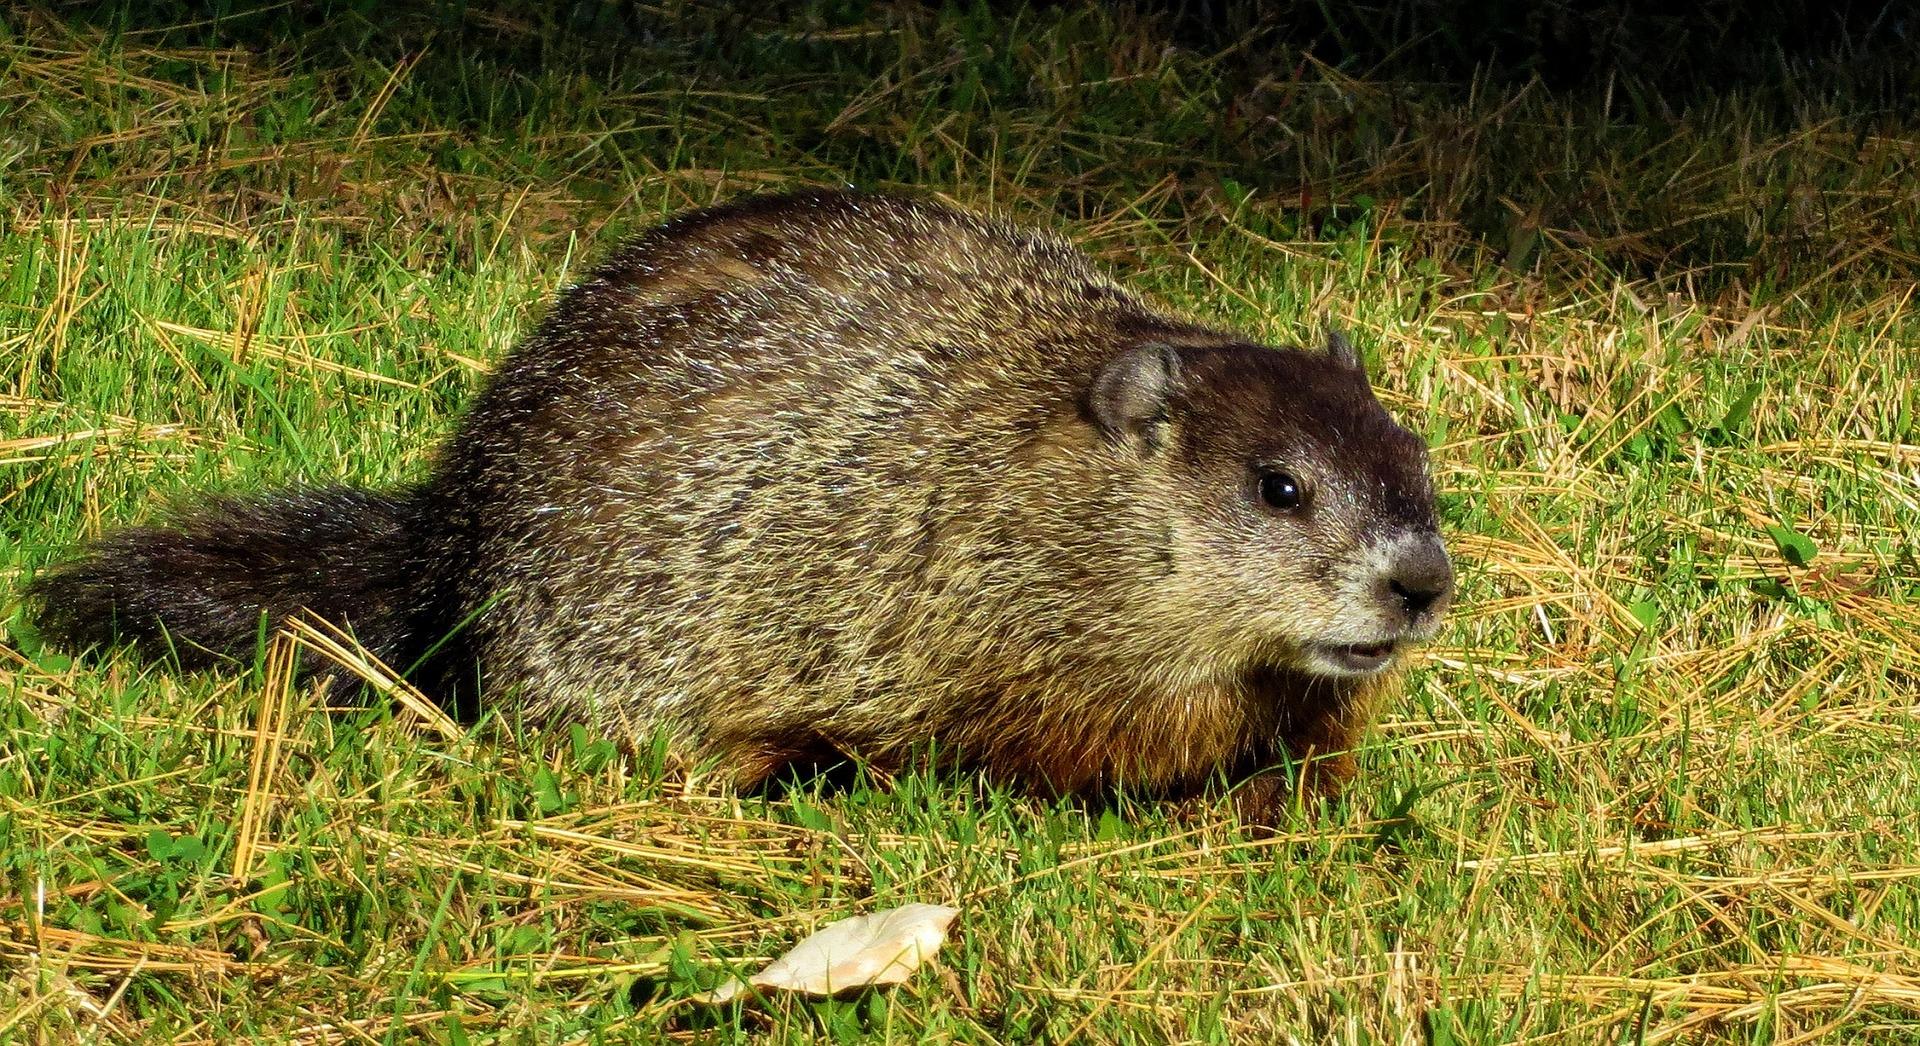 groundhog-1170875_1920.jpg